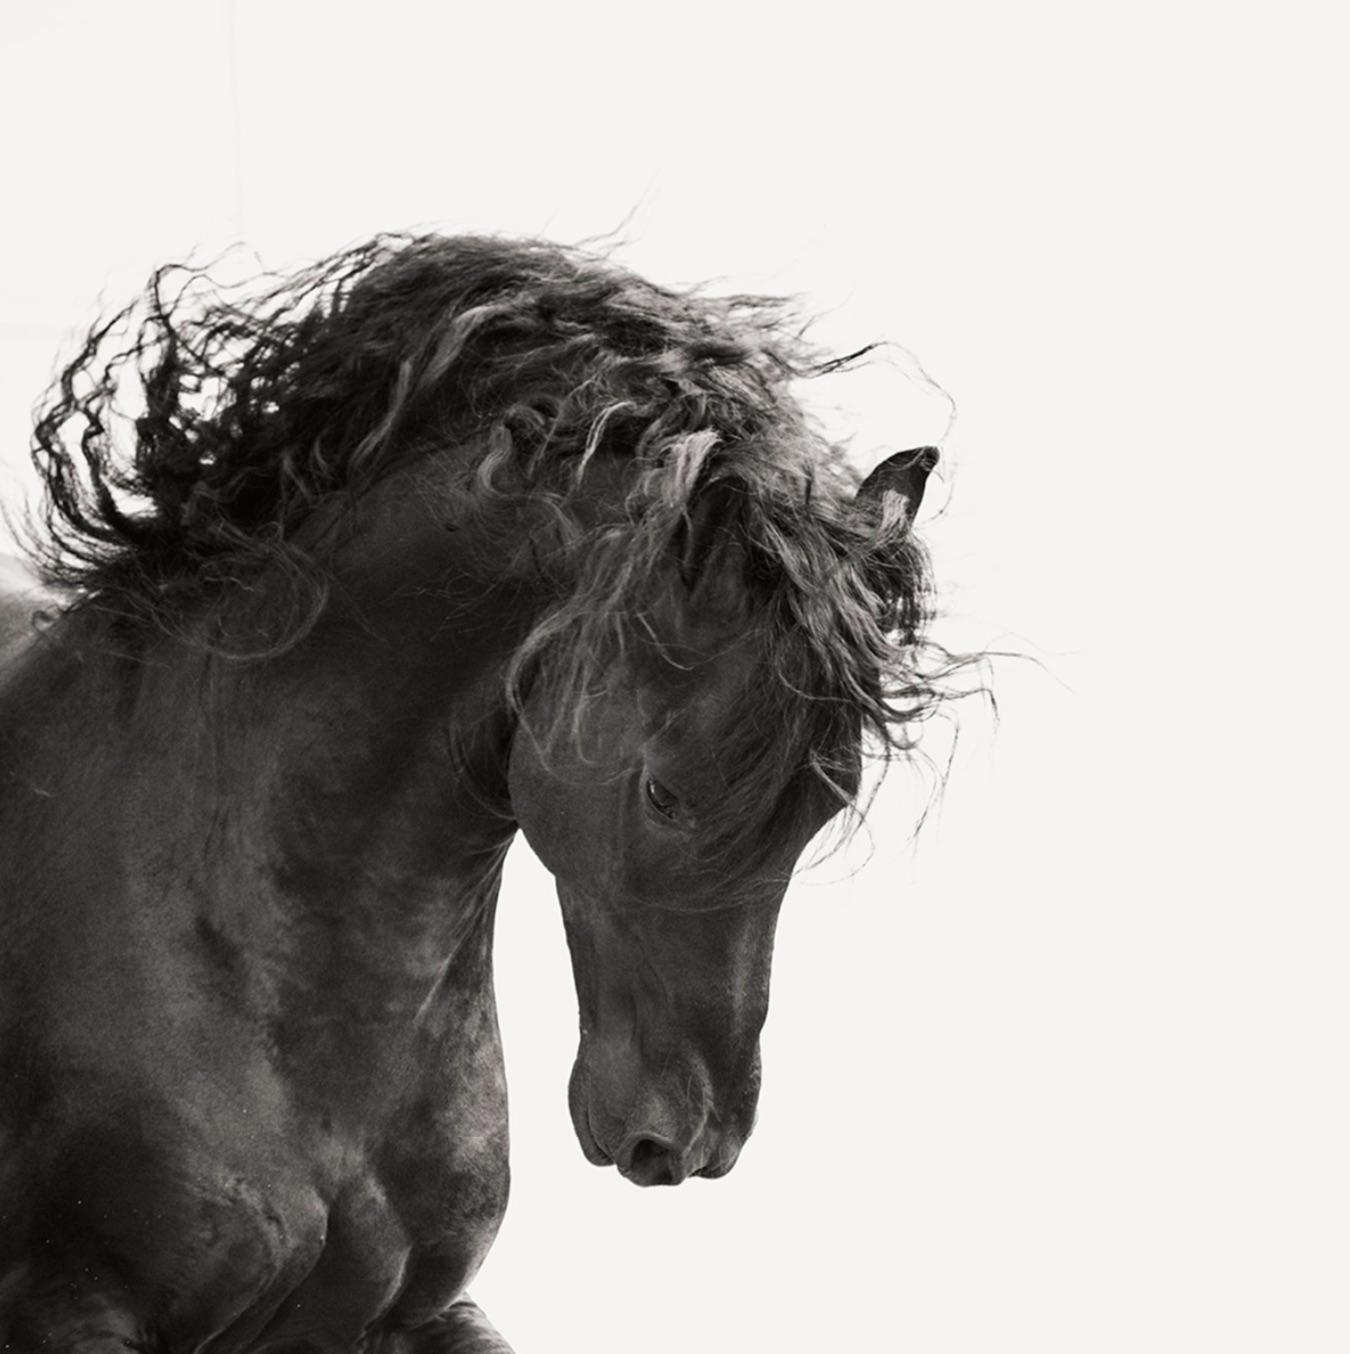 Dark Horse V 105cm x 105cm Ltd Edition of 12 - 6 remaining